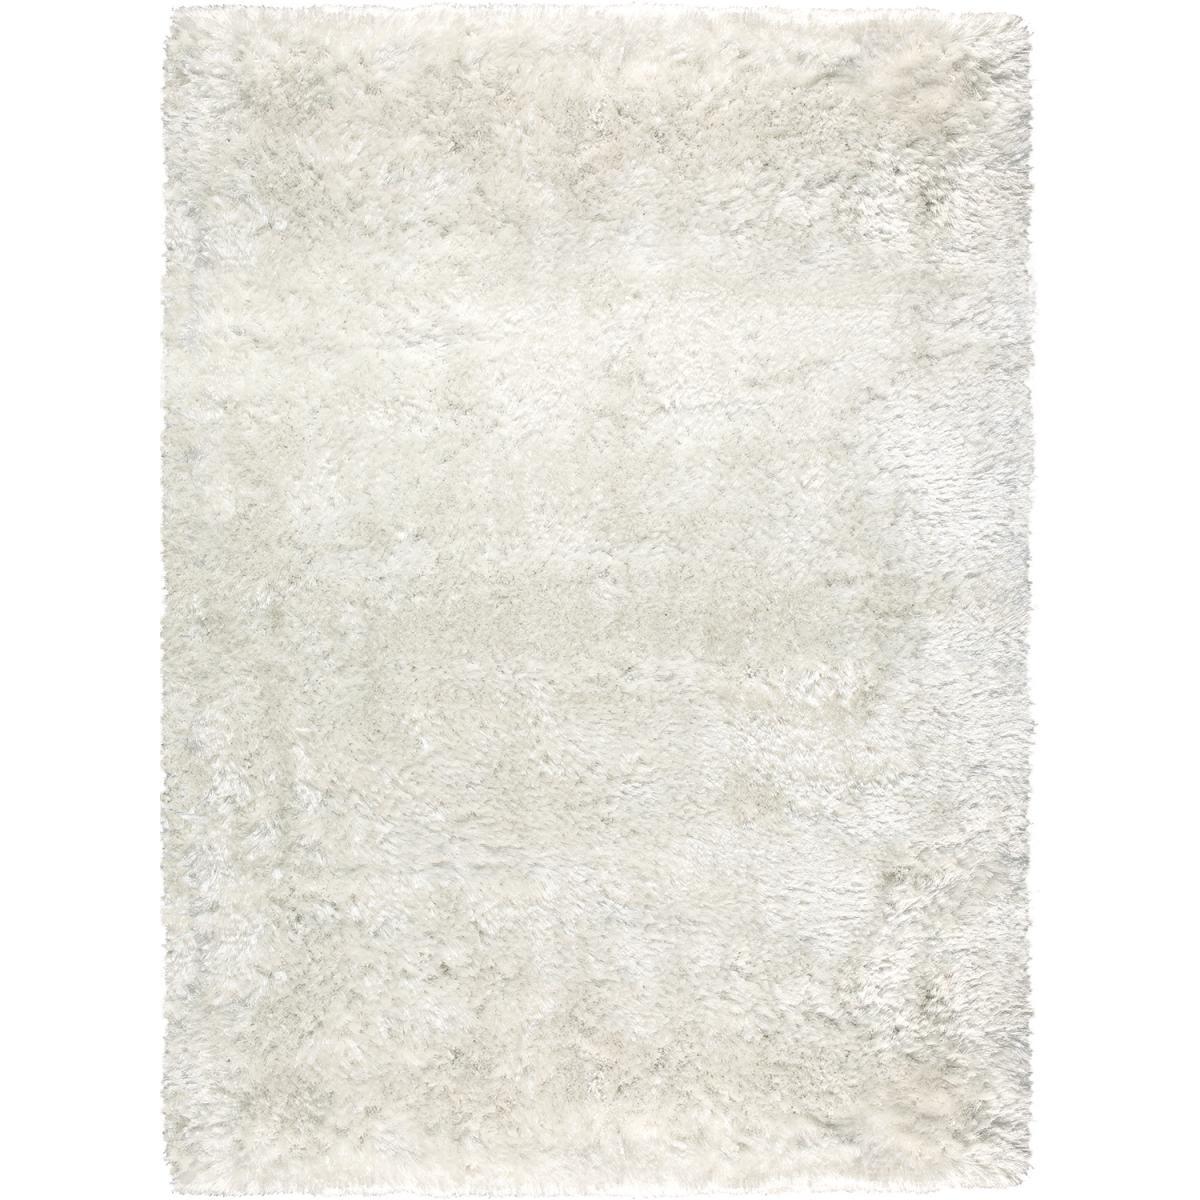 Tapis shaggy poils long en polyester blanc 170x240